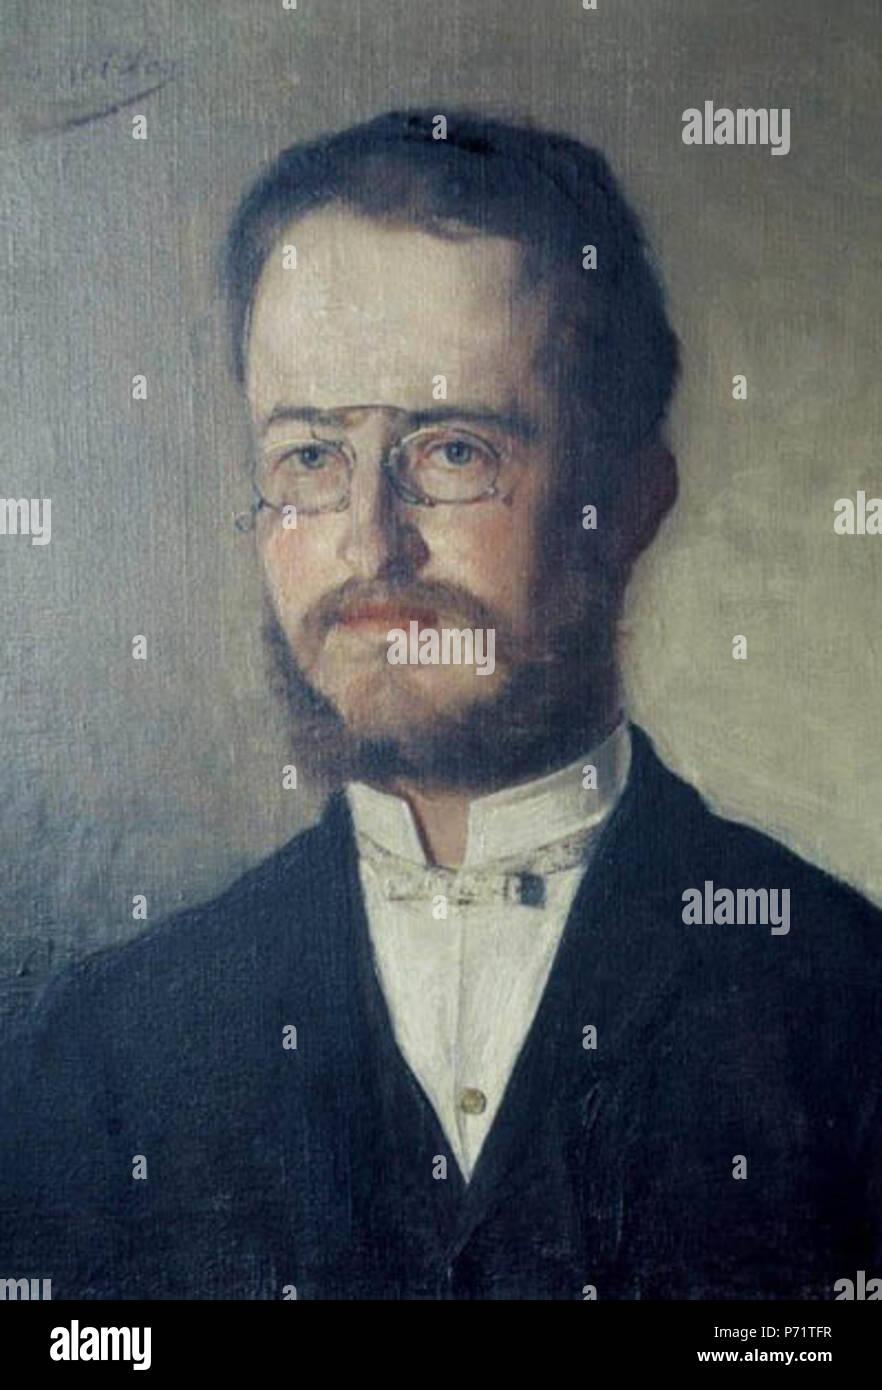 . Retrato de Luka Pintar 1890 145 Ivana Kobilca - Luka Pintar Imagen De Stock